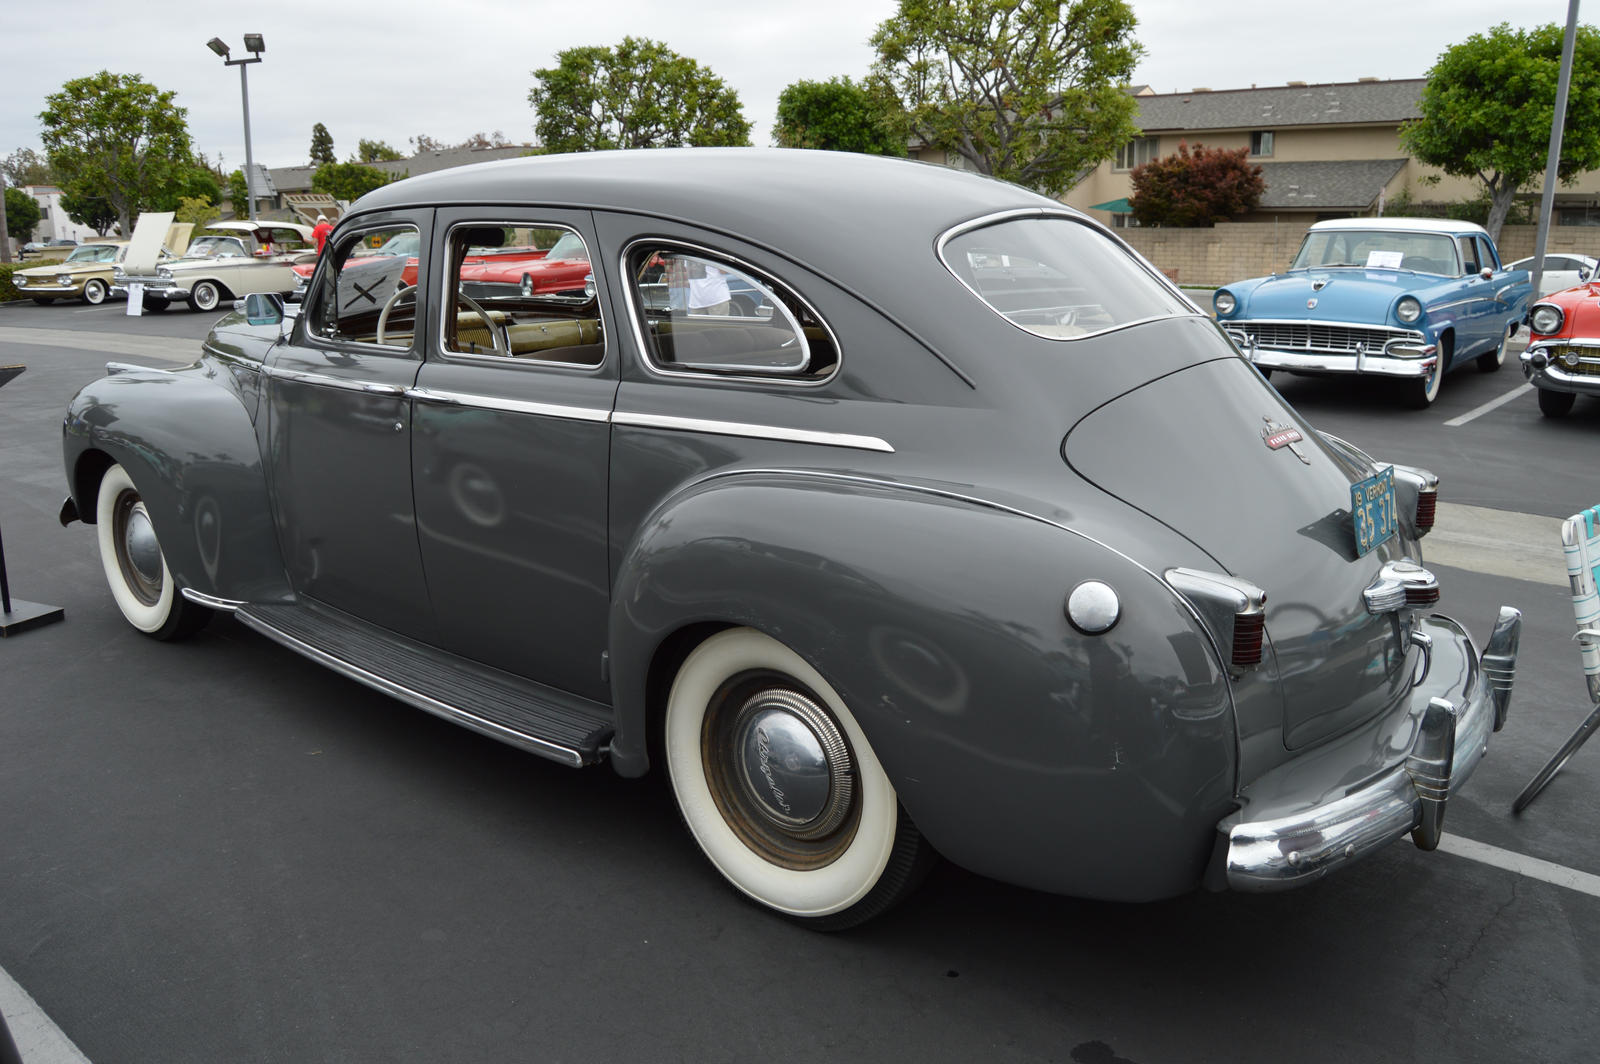 1941 Chrysler Royal Sedan Iv By Brooklyn47 On Deviantart